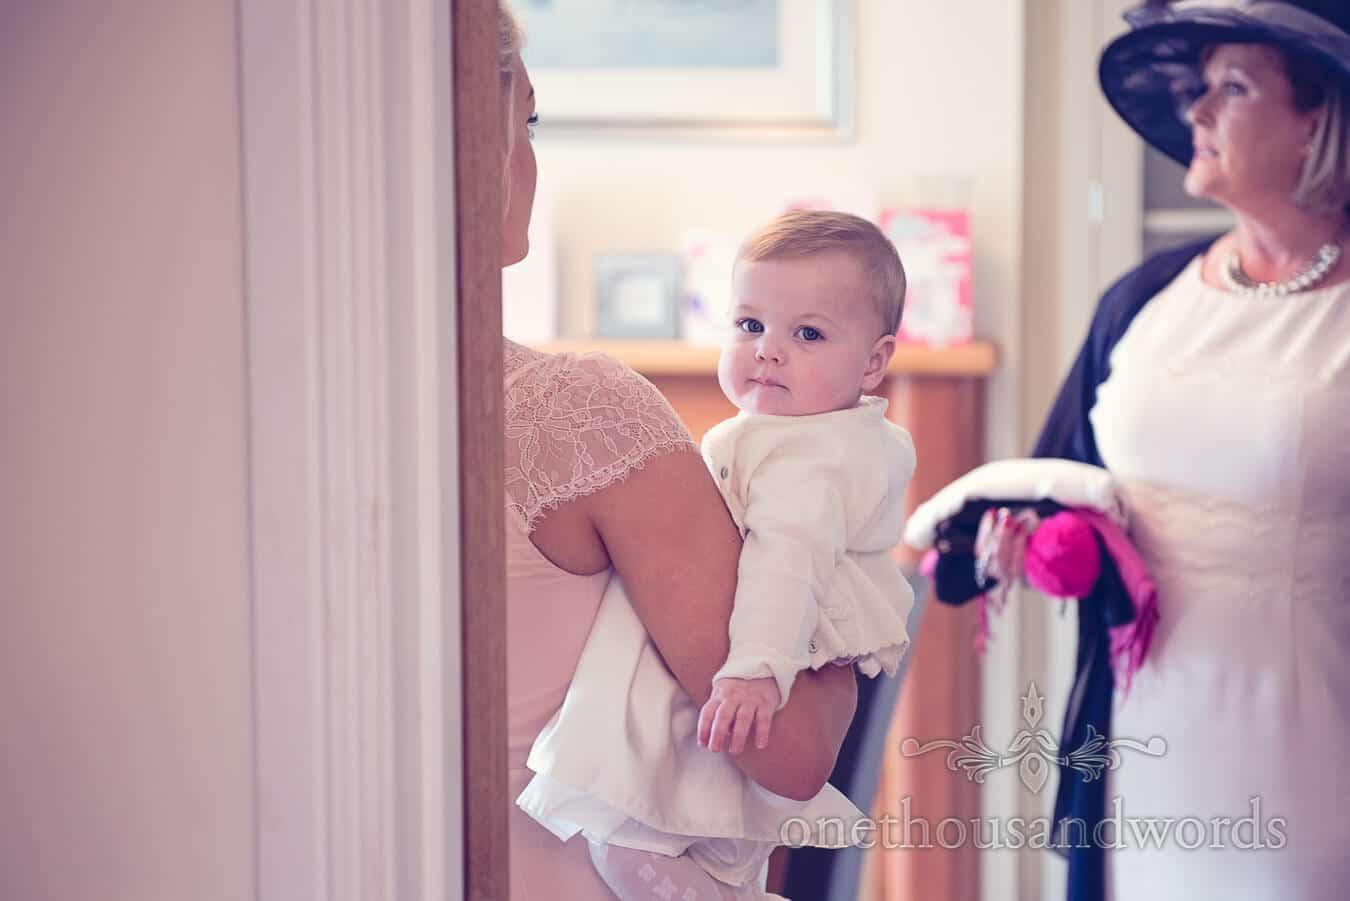 Baby on wedding morning